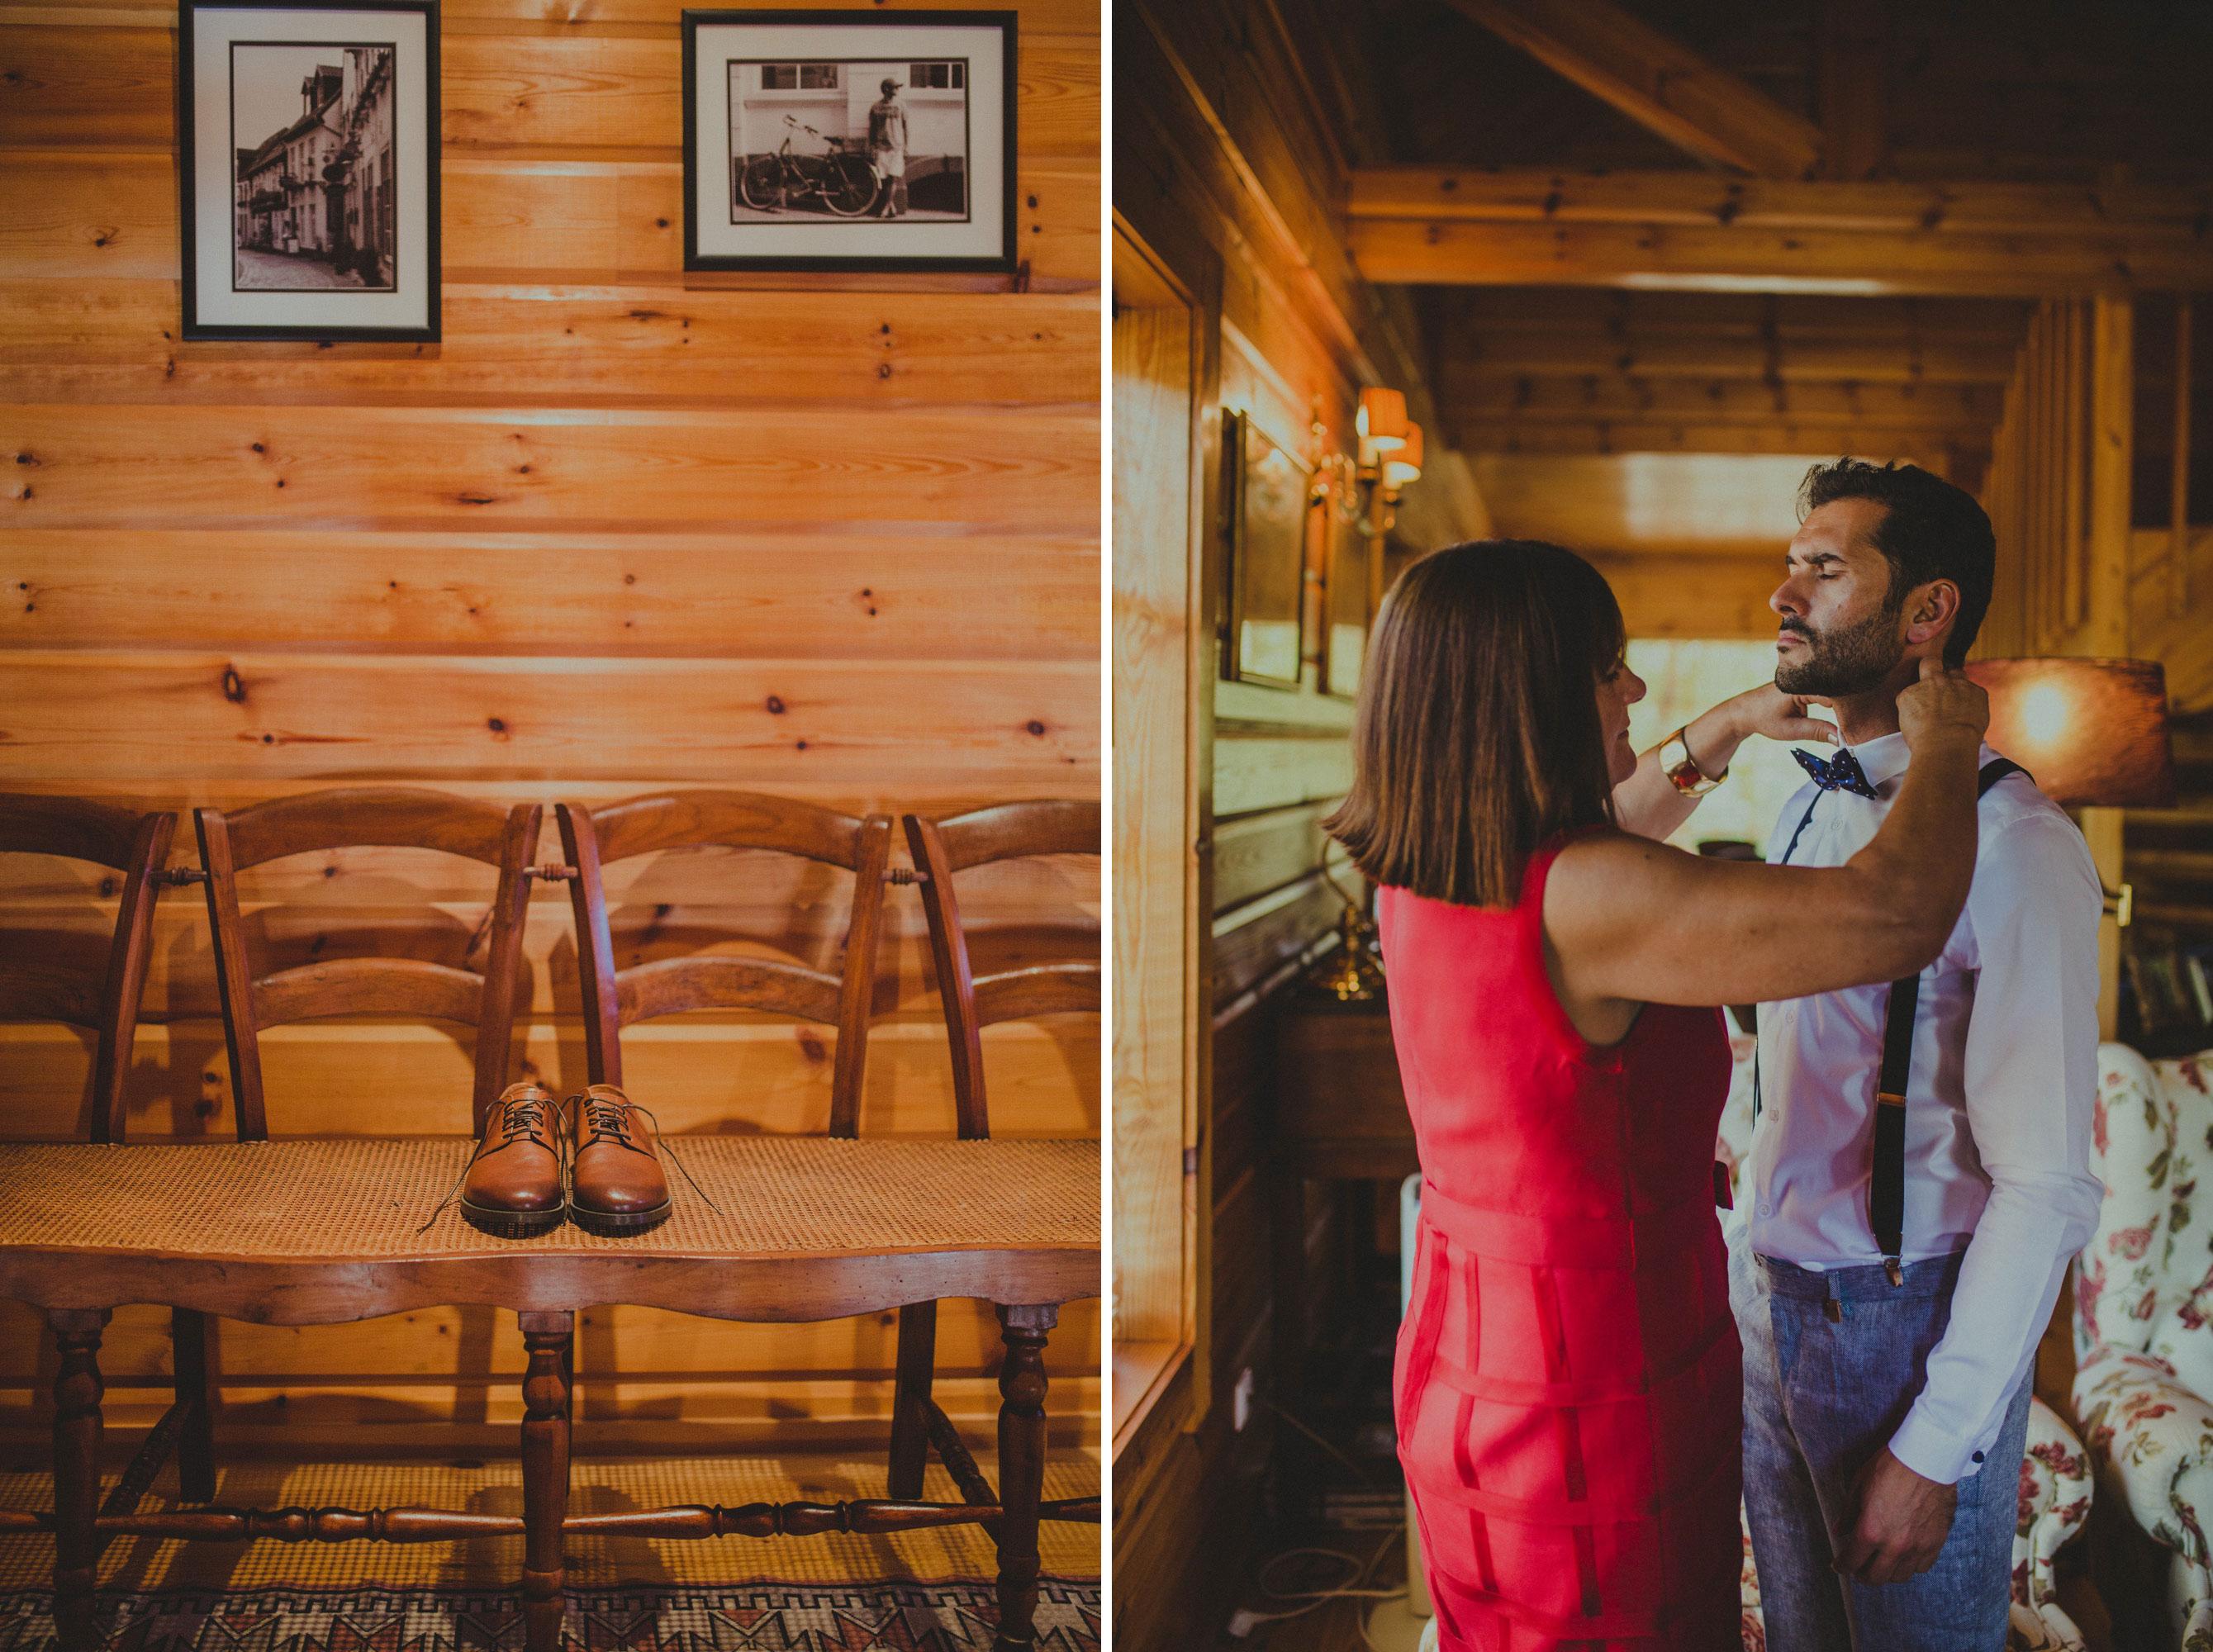 102-carina-e-samuel-wedding-casamento-quinta-dos-rouxinois-rustico-my-fancy-wedding-mafra-malveira-lisboa-sintra-cascais-filipe-santiago-fotografia-fotografo-lifestyle-destination-portugal